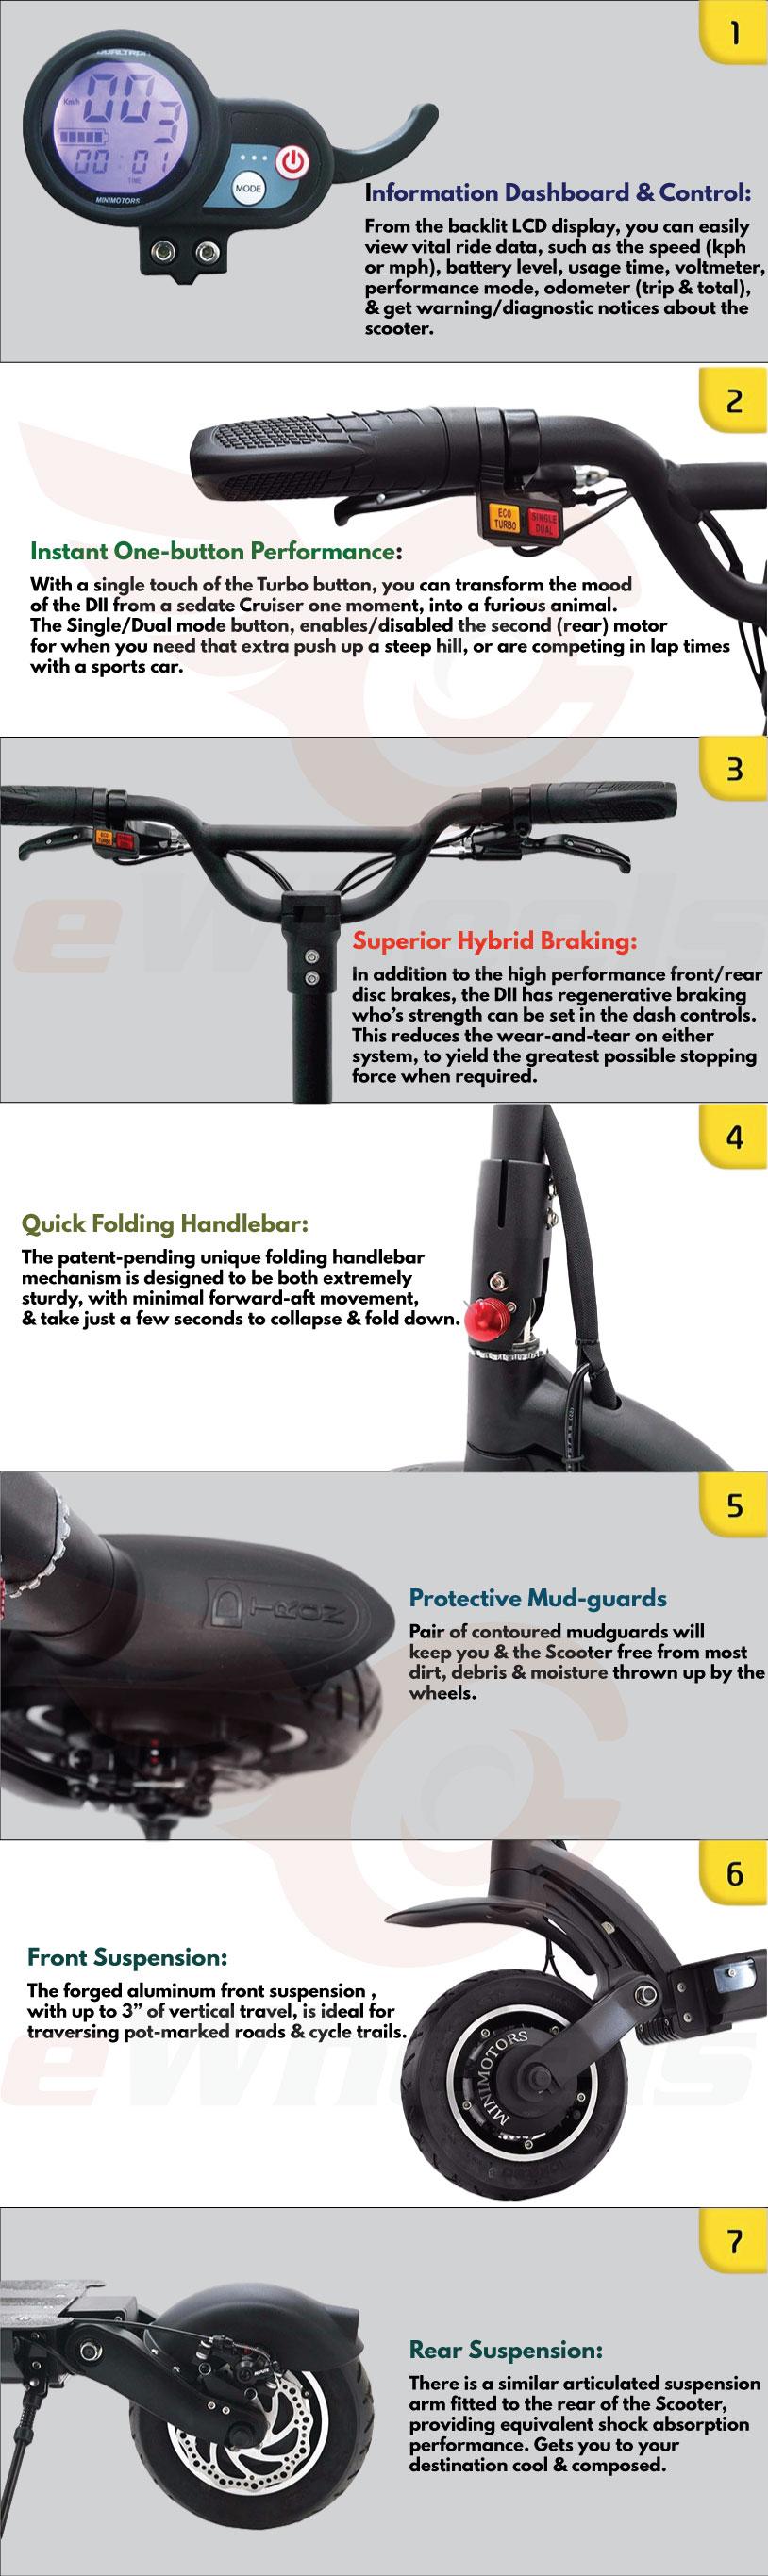 Dualtron II 2 EX EX+ LTD Minimotors Product Sheet 1